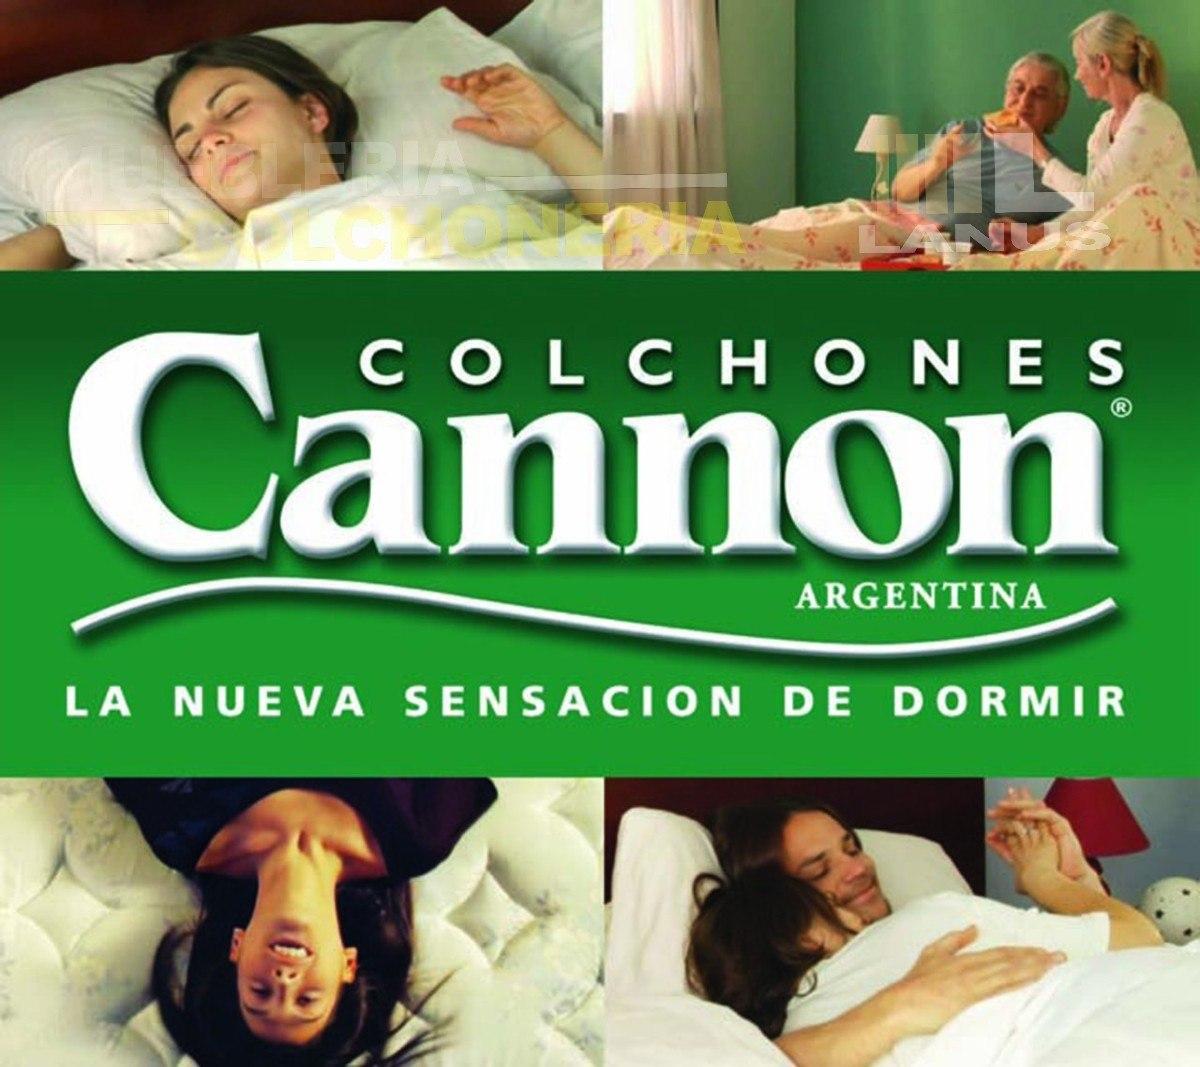 5c9e64b670d Colchón Cannon Renovation - Colchones de Espuma - Marcelo Boggio